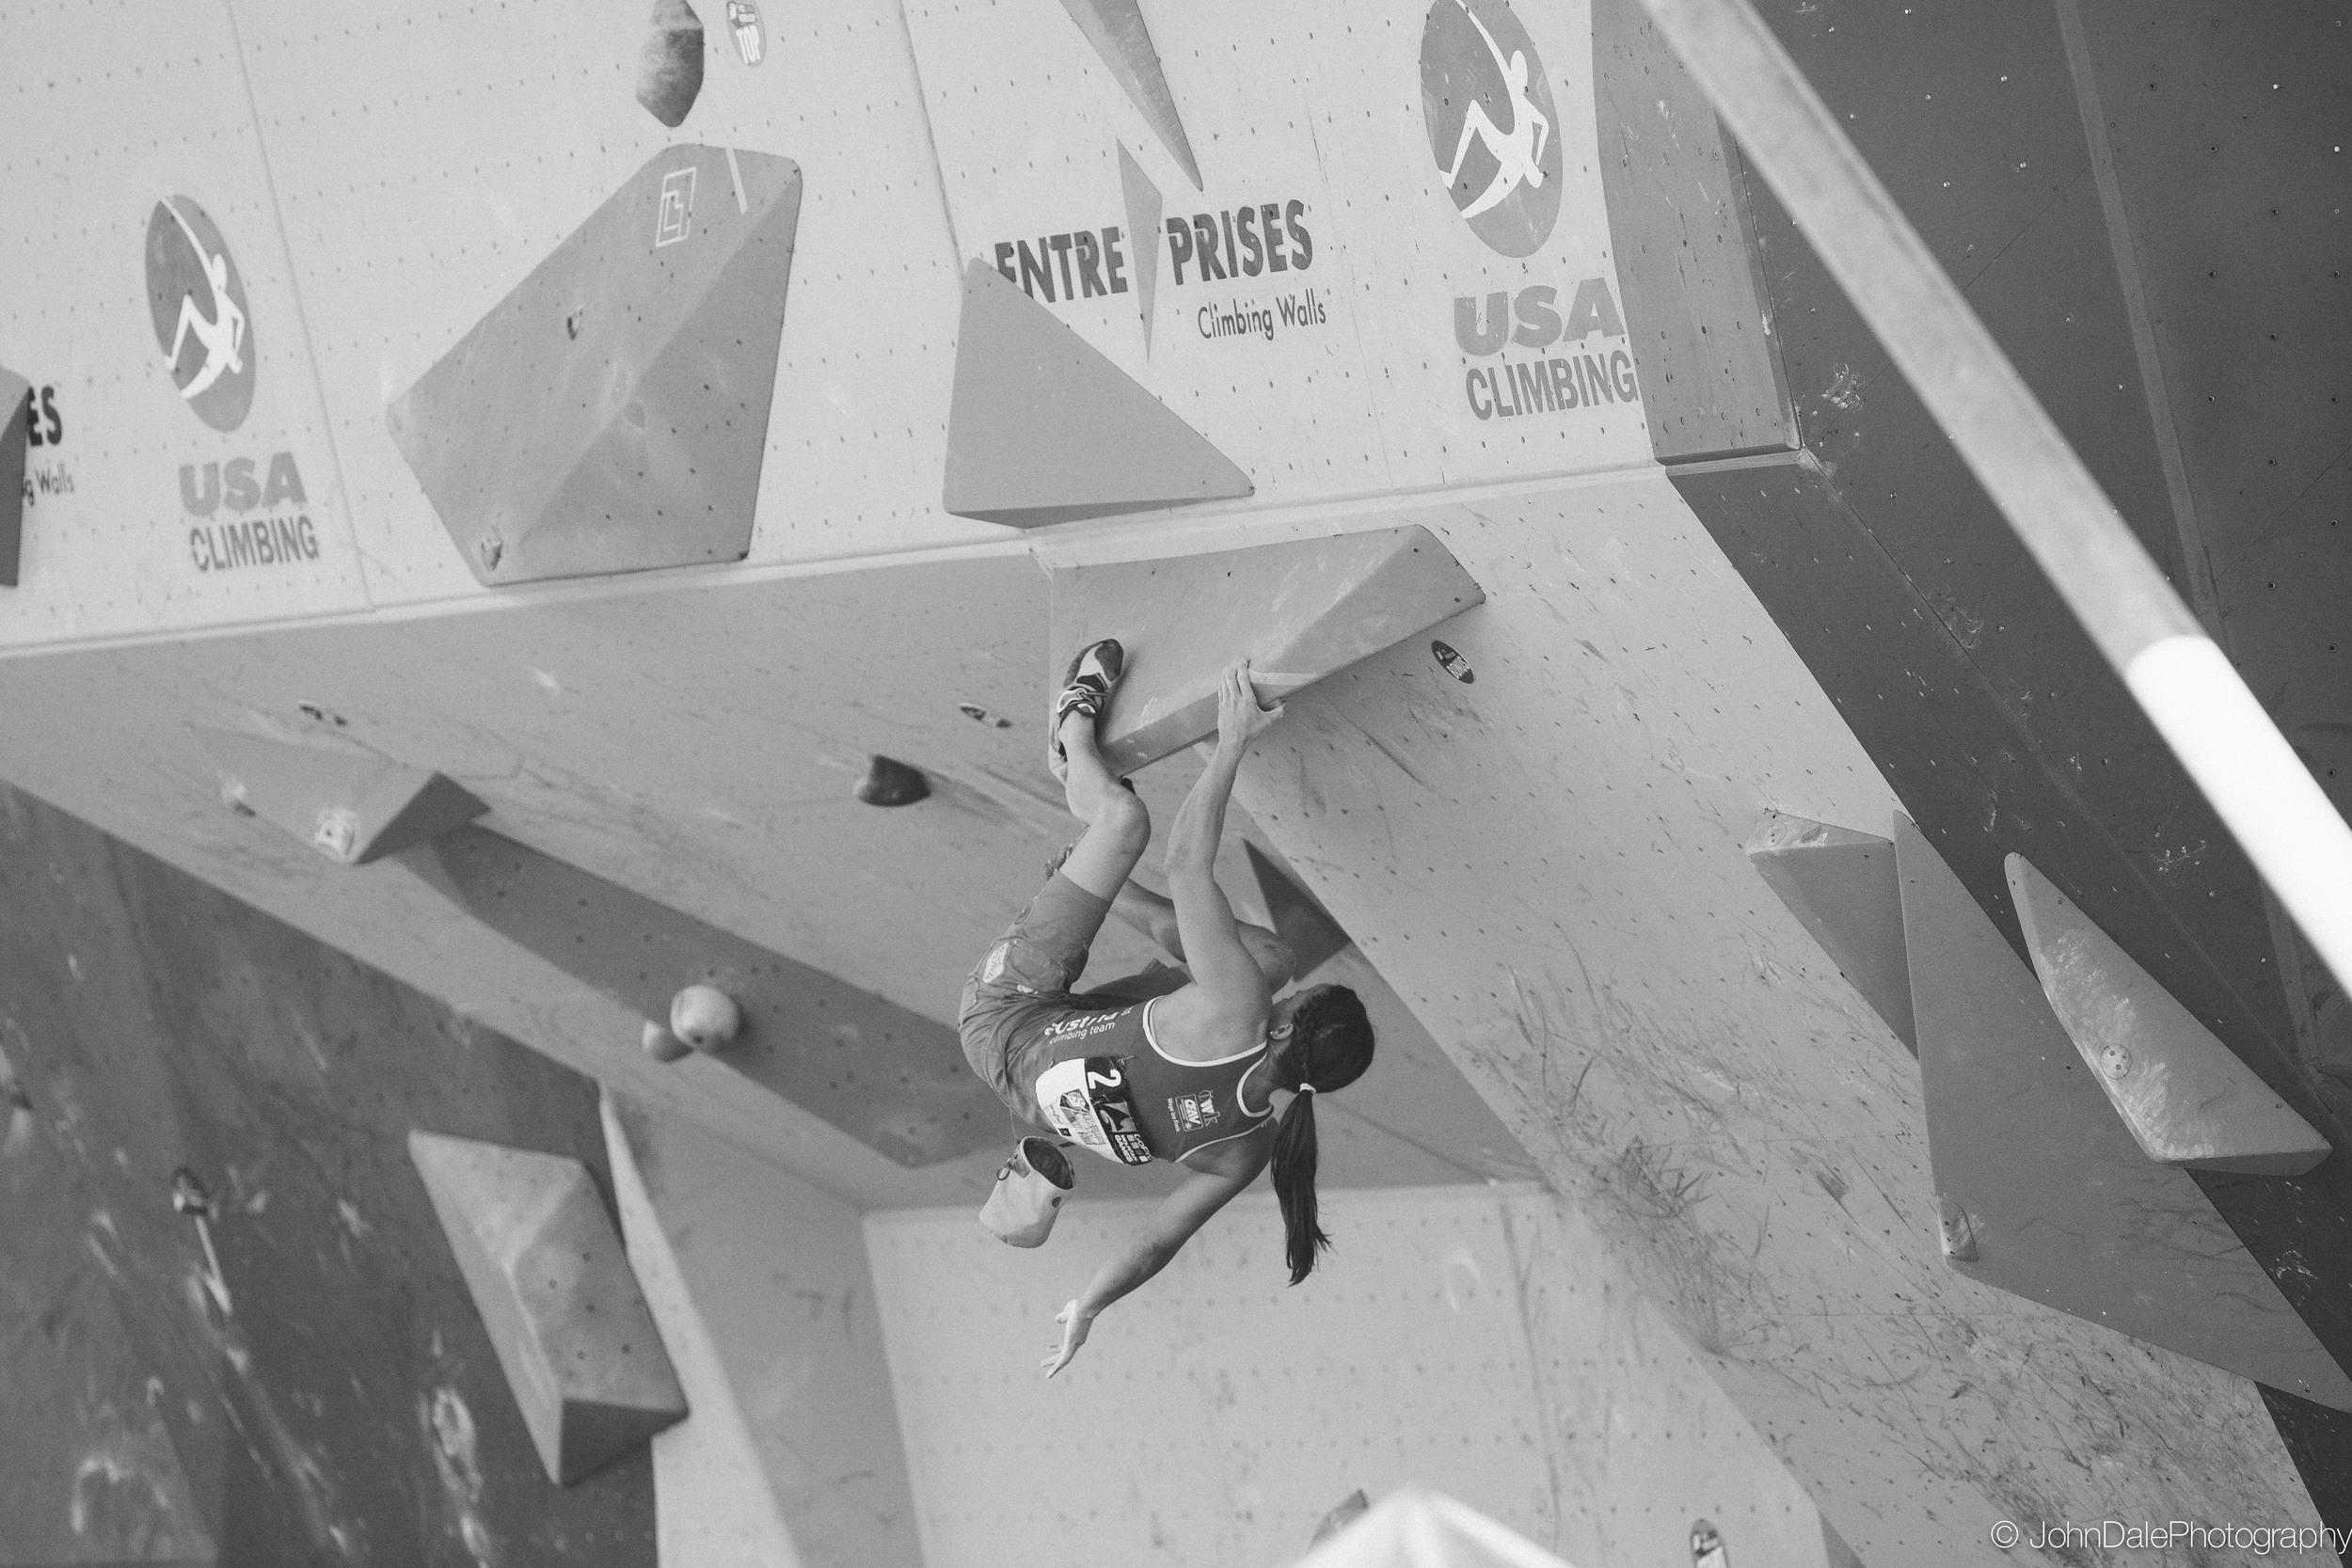 Climbing at the 2014 GoPro Mountain Games-13.jpg